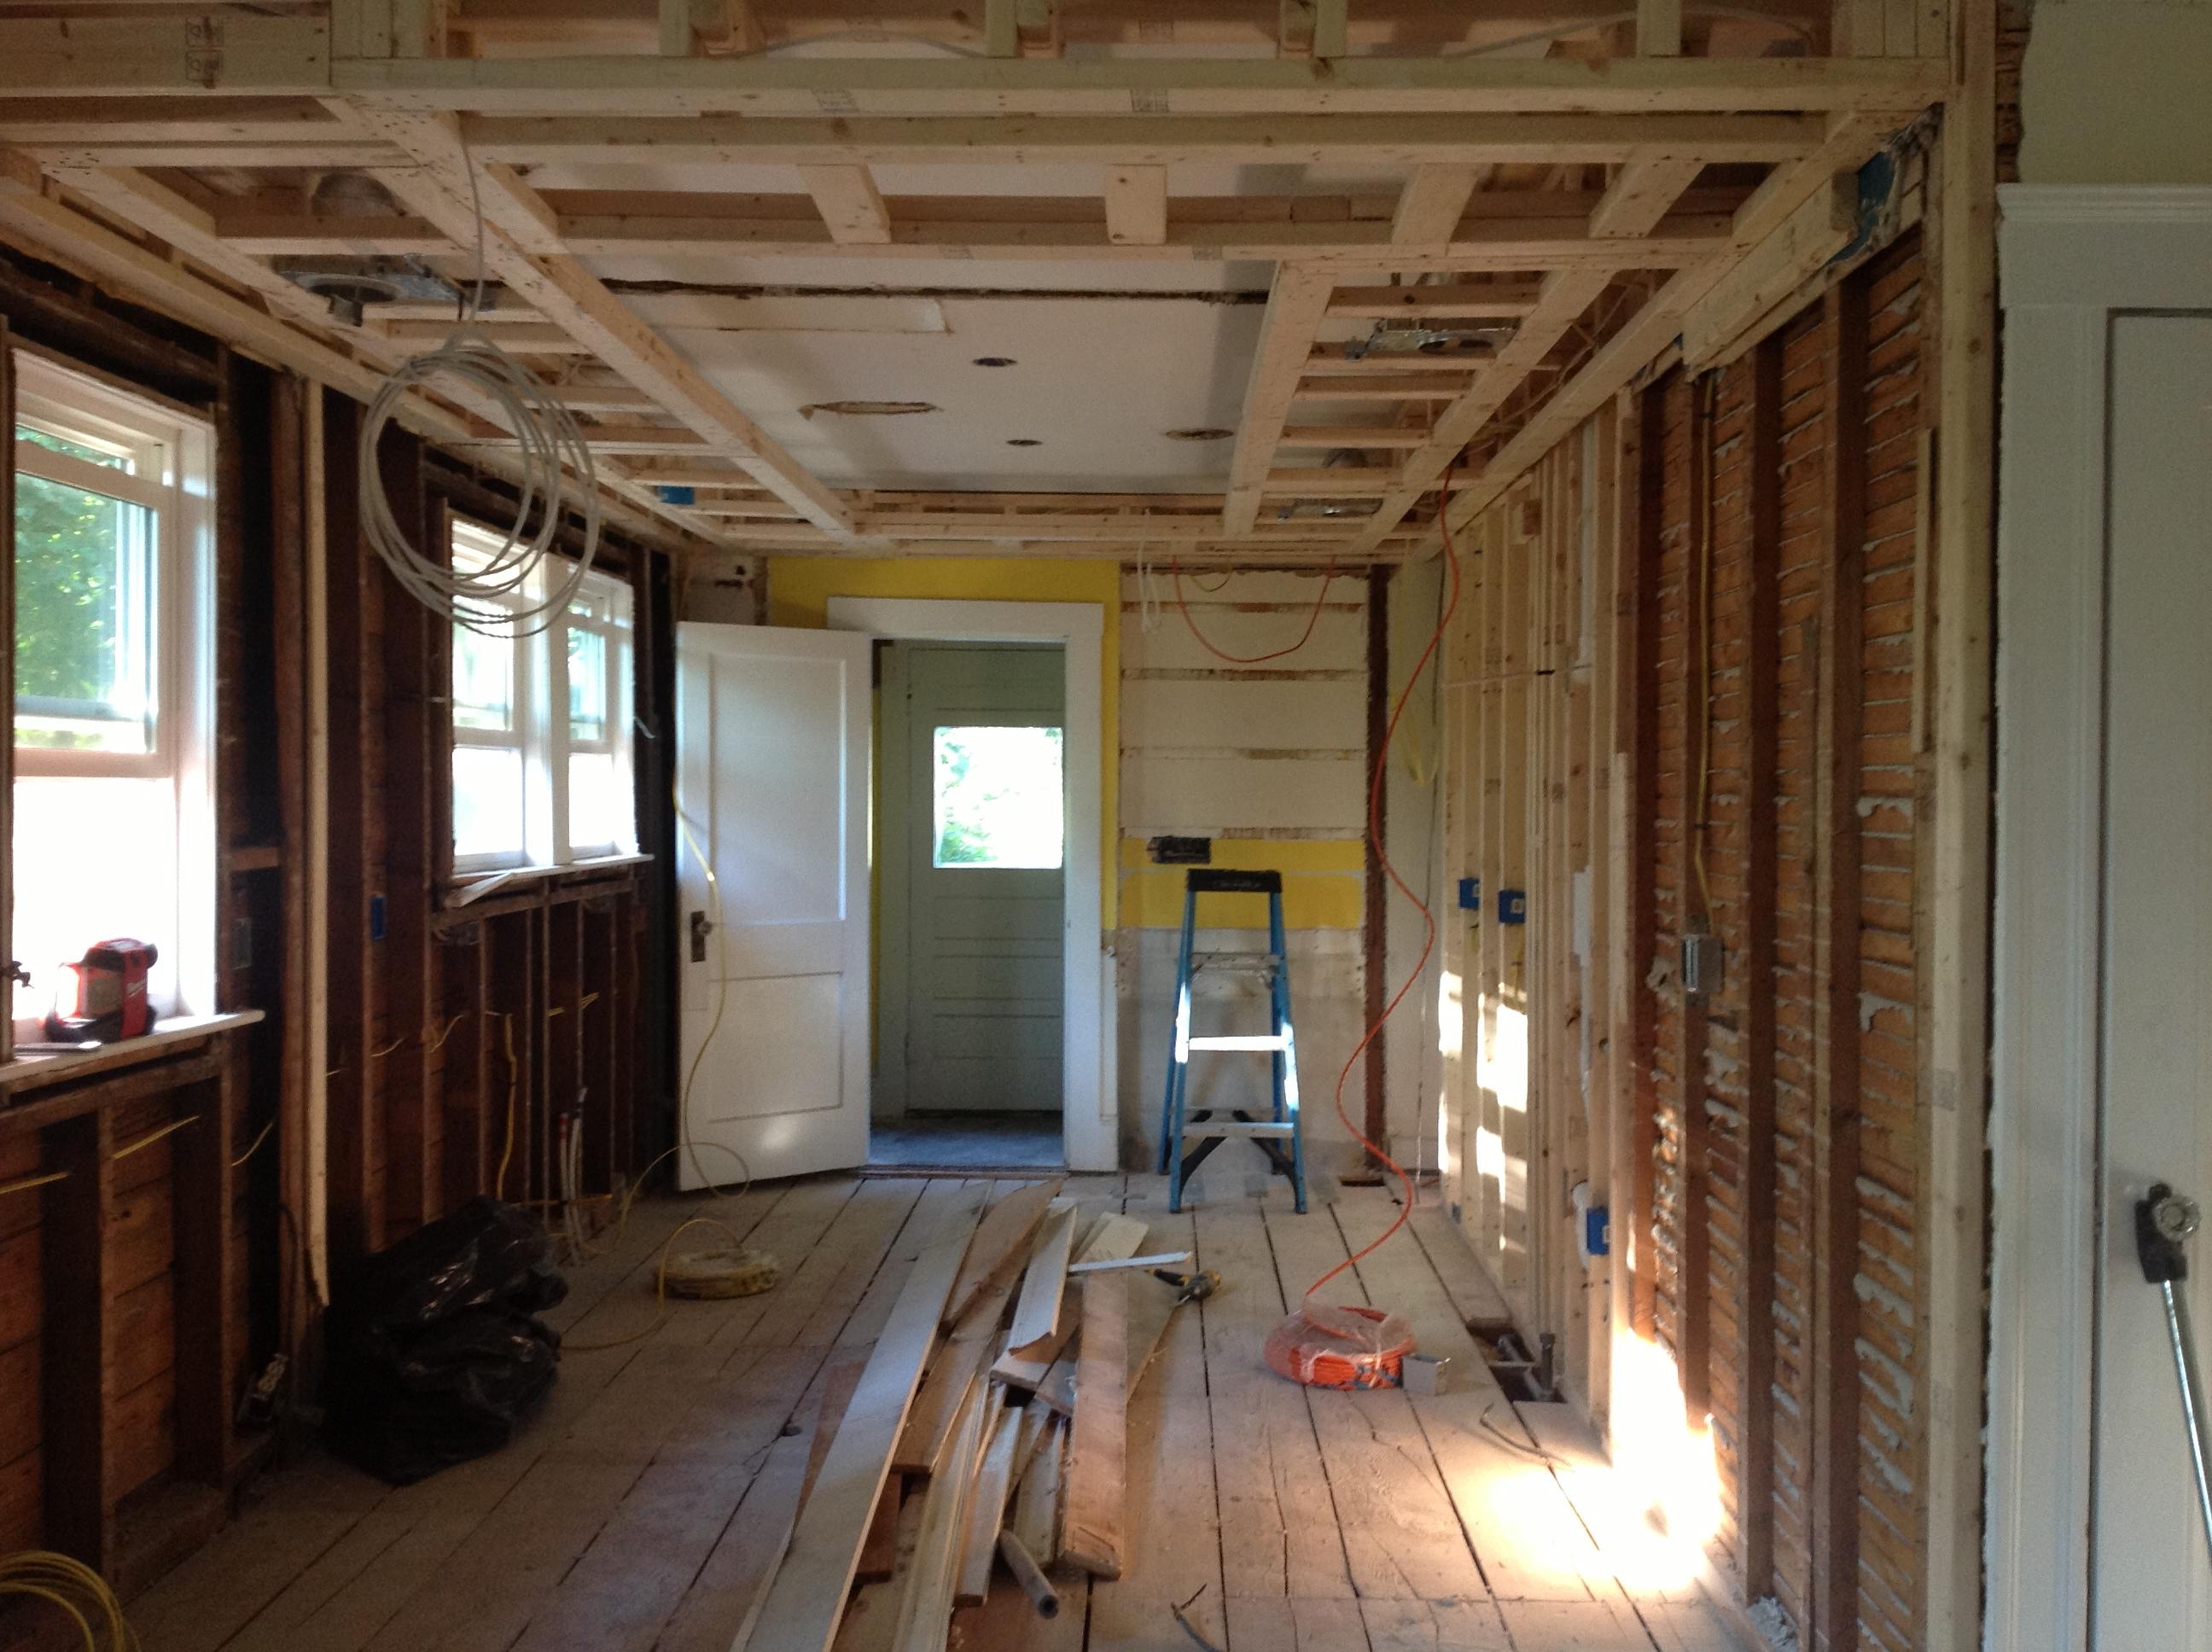 Retro-Mod Kitchen Renovation - Week 2 | Counterpane Interiors: Age ...